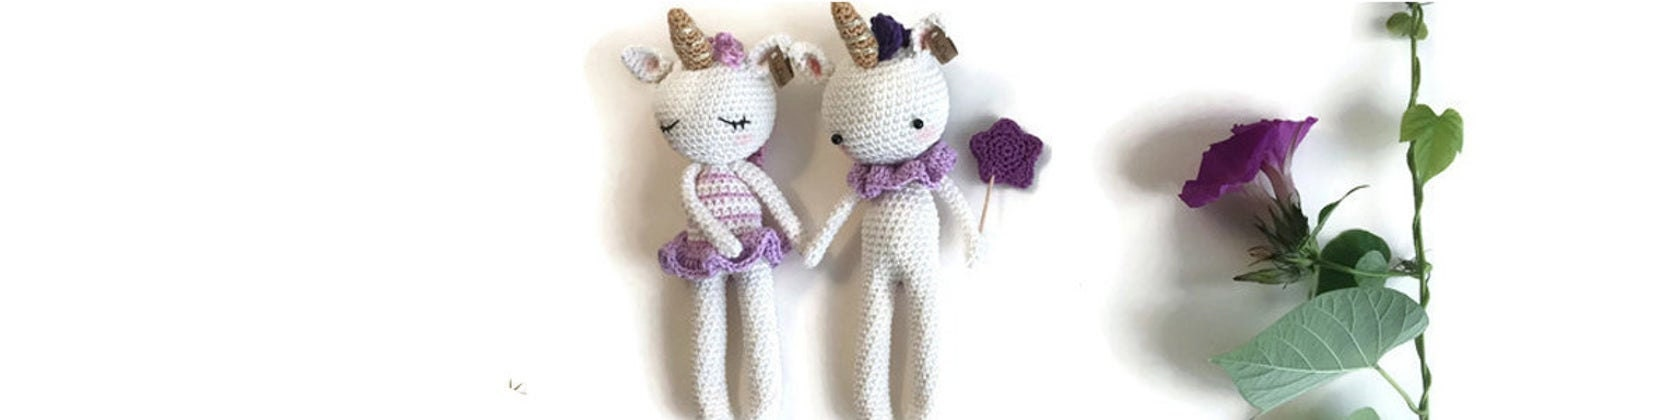 Bambole in miniatura MERCERIA CUCITO Donna KNITTING PATTERNS Set